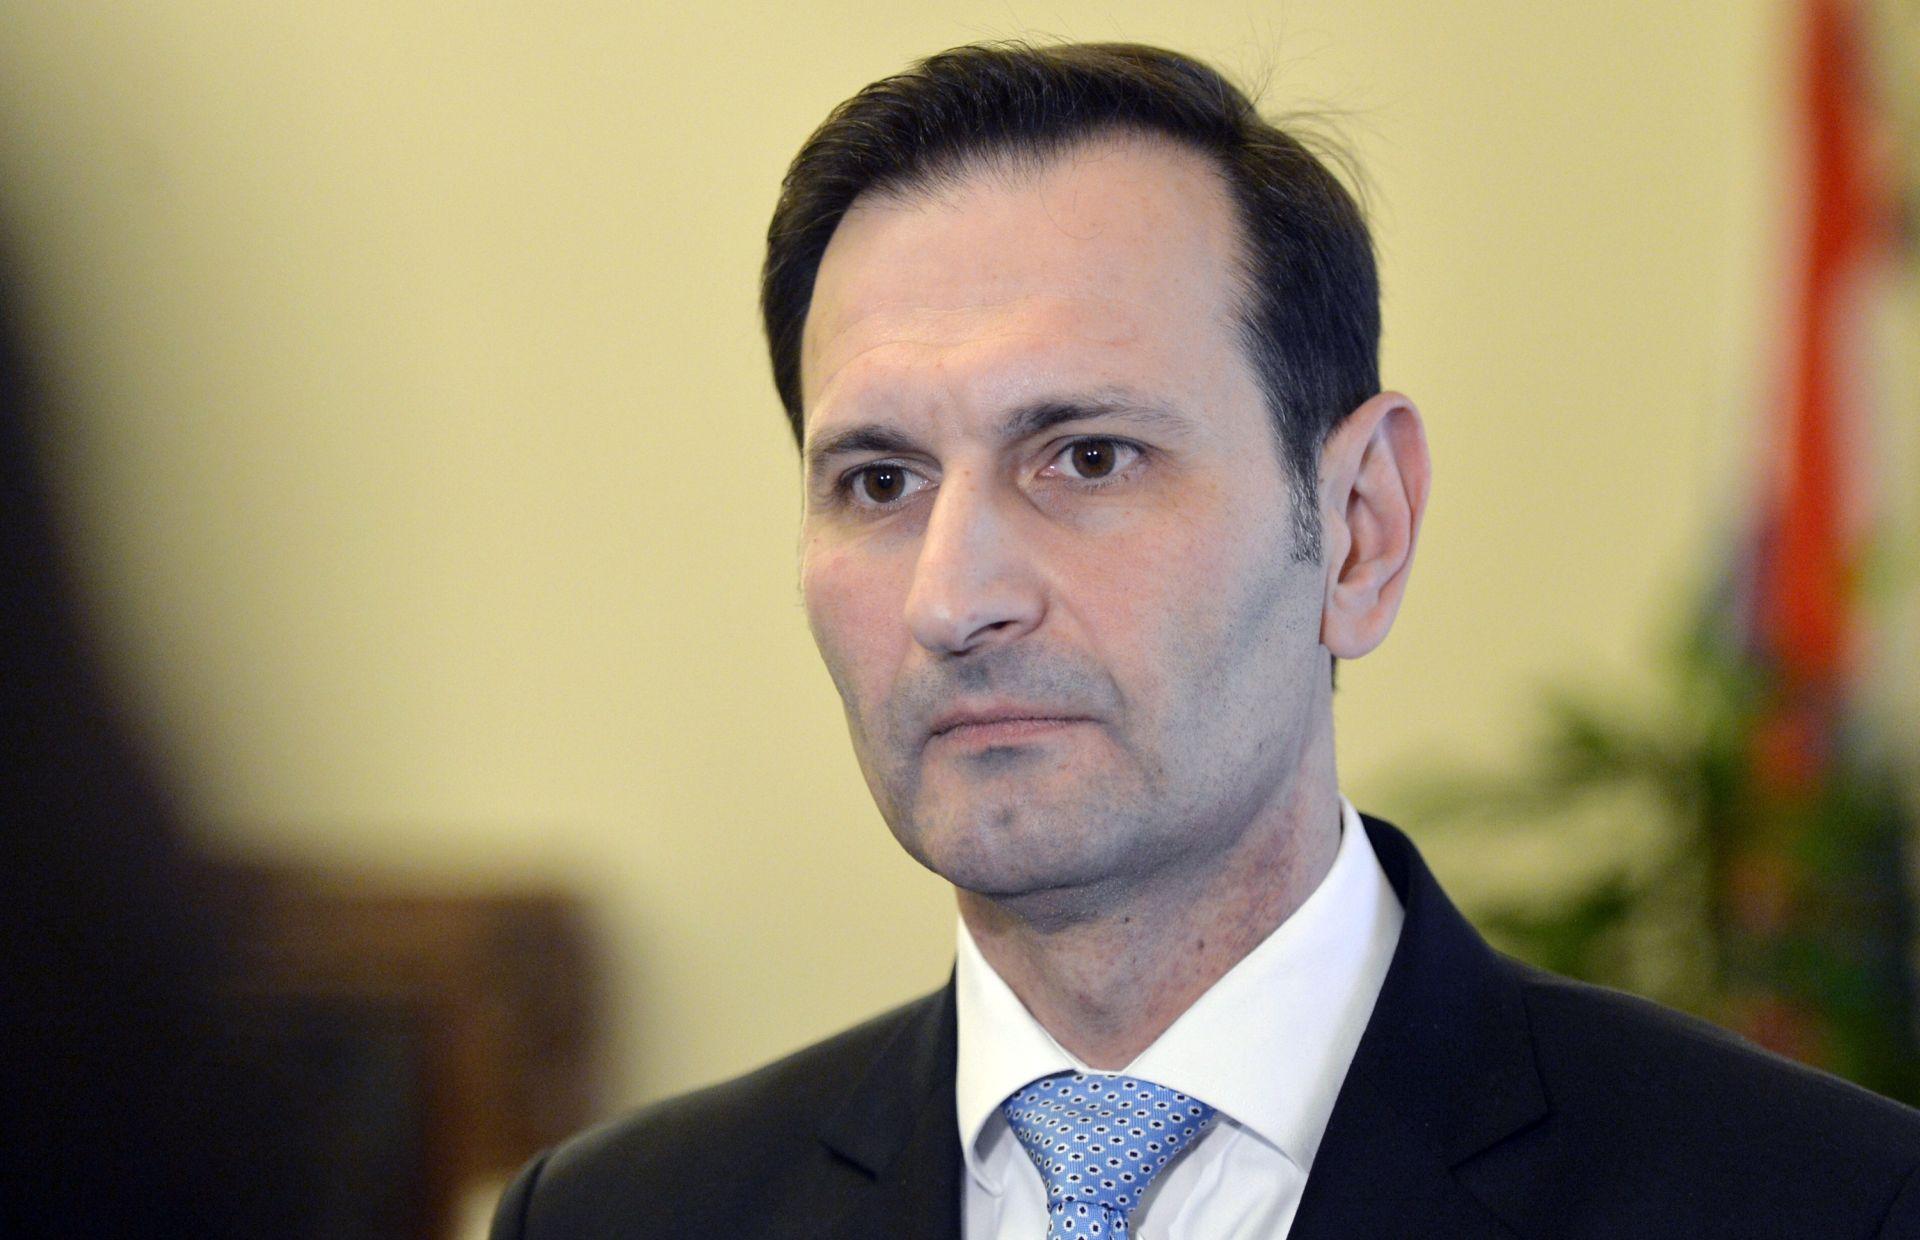 MIRO KOVAČ 'Ispravljamo propuste bivše Vlade'